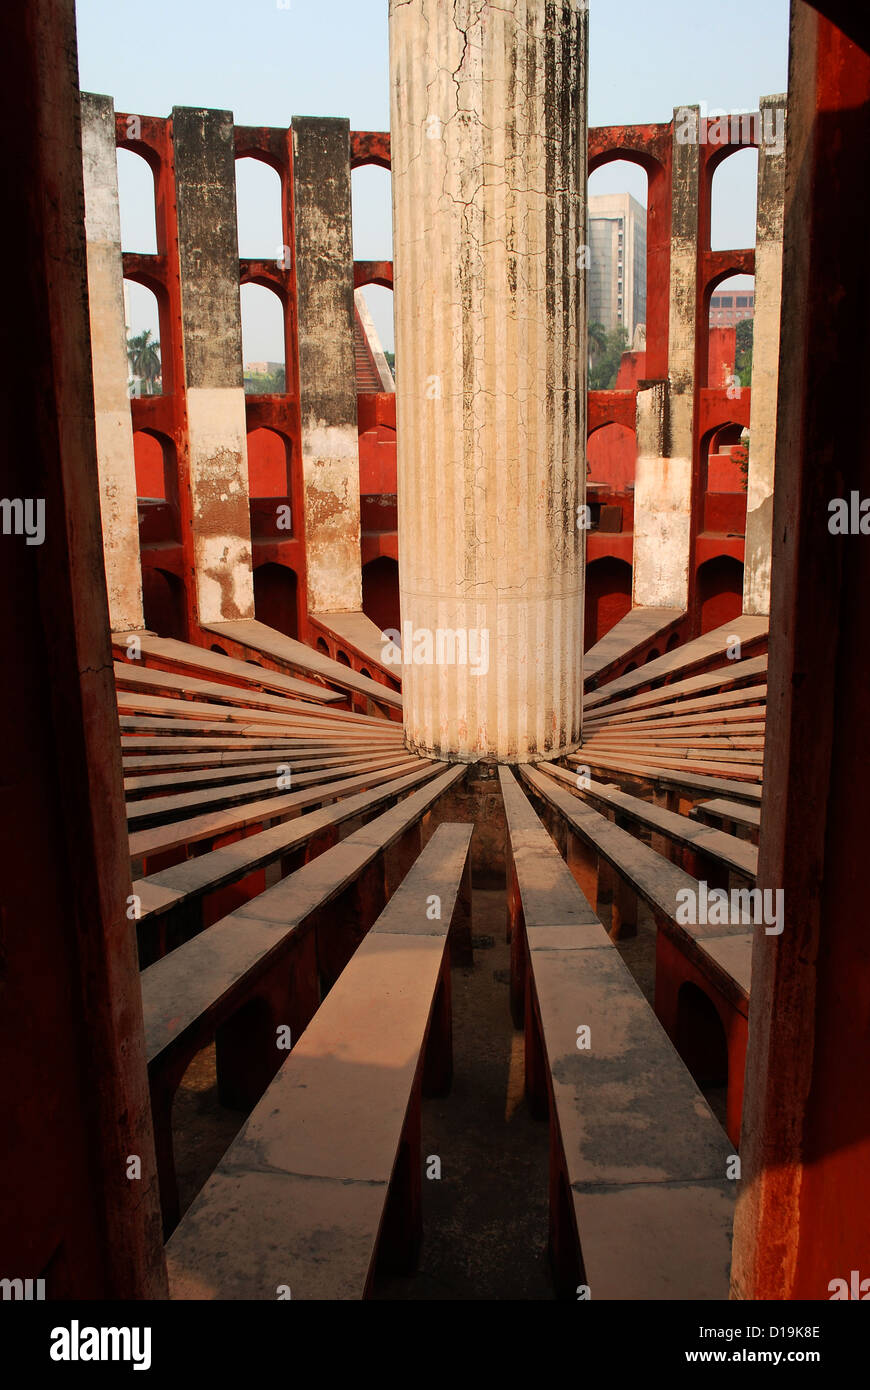 A Jantar Mantar, un antiguo observatorio astronómico en Delhi, India Imagen De Stock